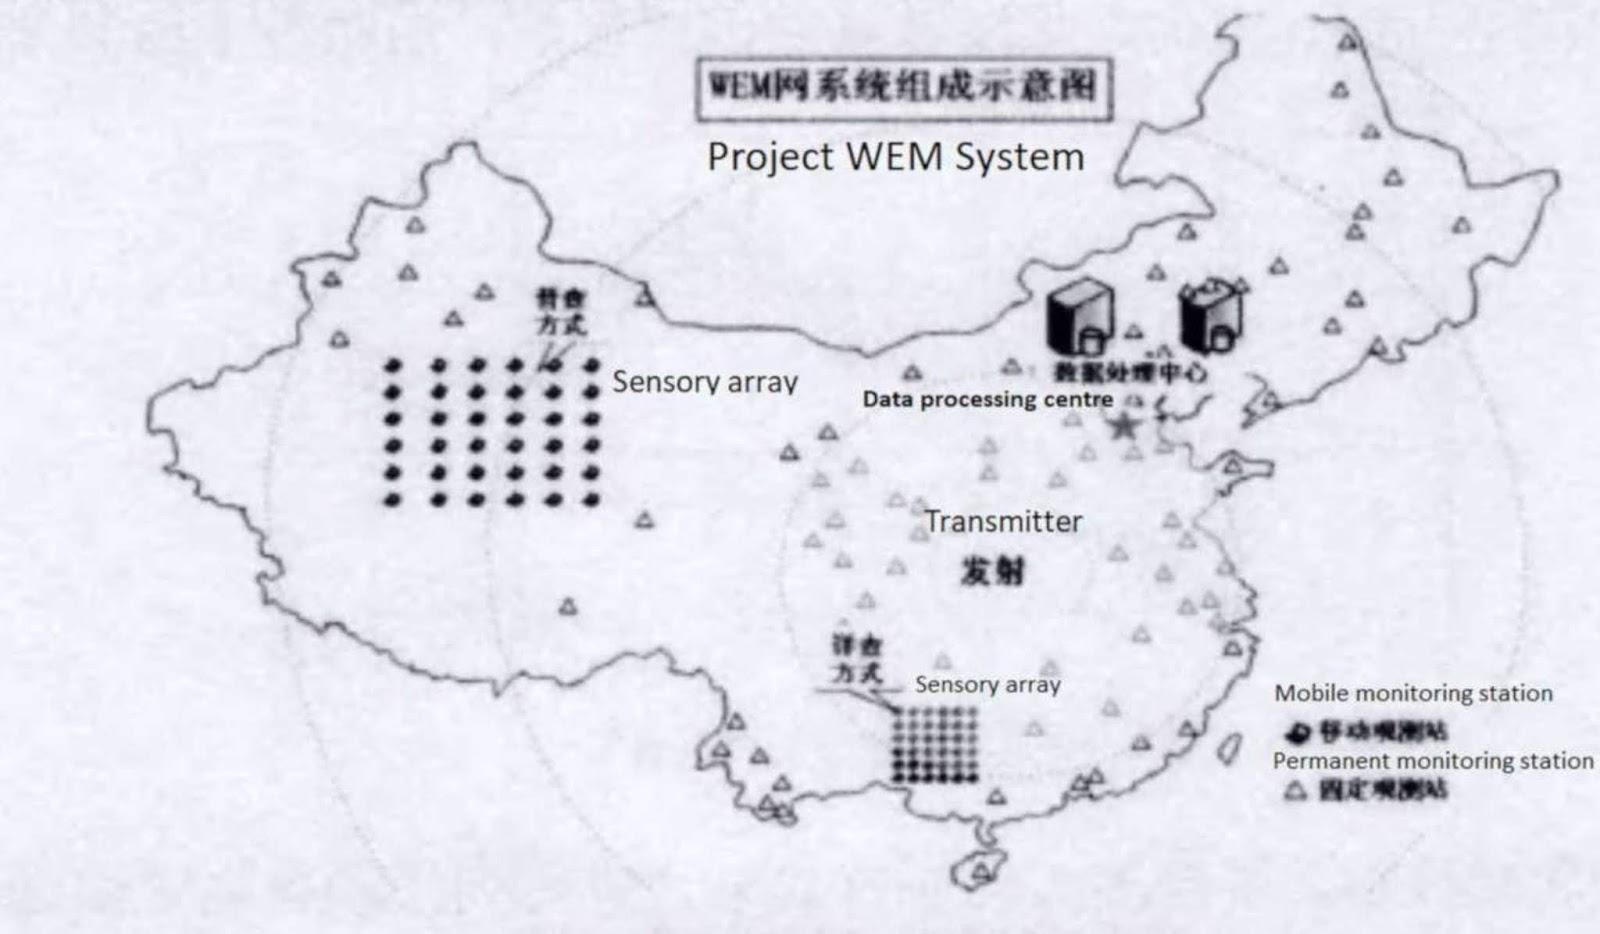 China membangun antena raksasa seukuran New York untuk berkomunikasi dengan kapal selam